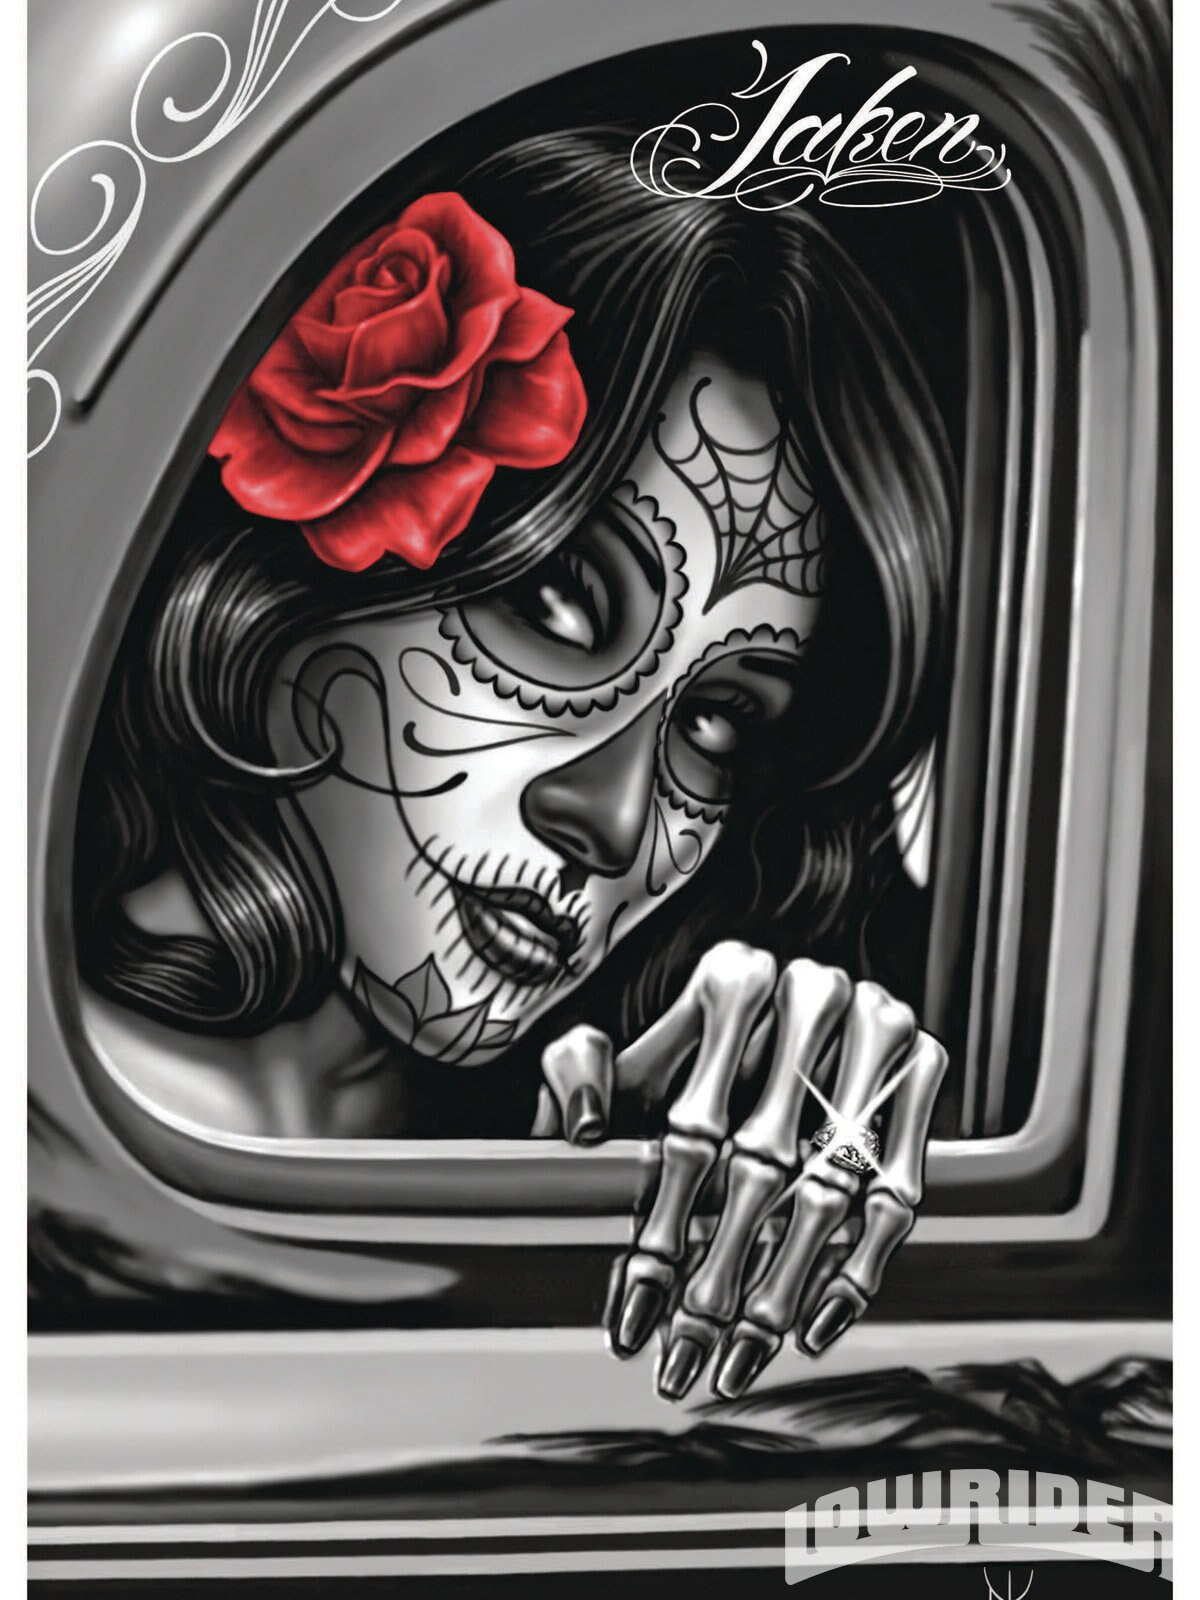 david gonzales art lowrider magazine